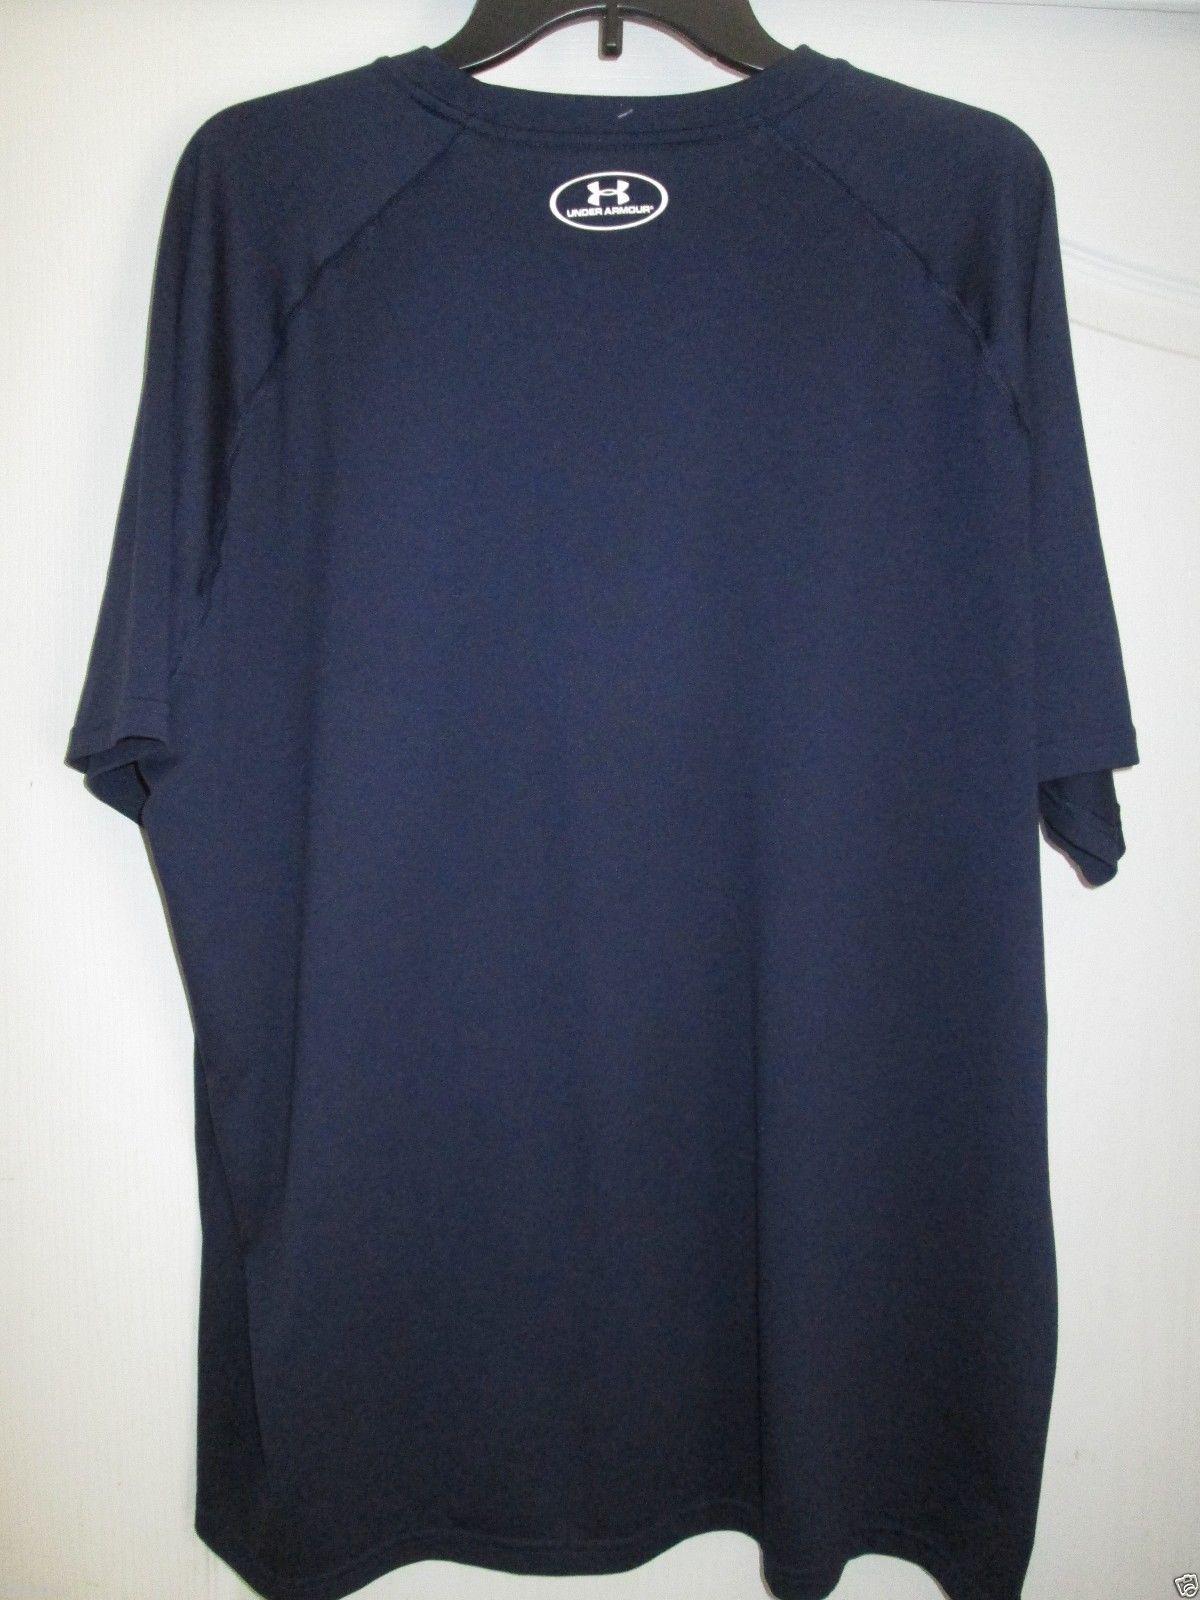 c6bf227e9c4502 Under Armour Heatgear 1228539 Crewneck Short Sleeve Men s T-Shirt Navy 2XL